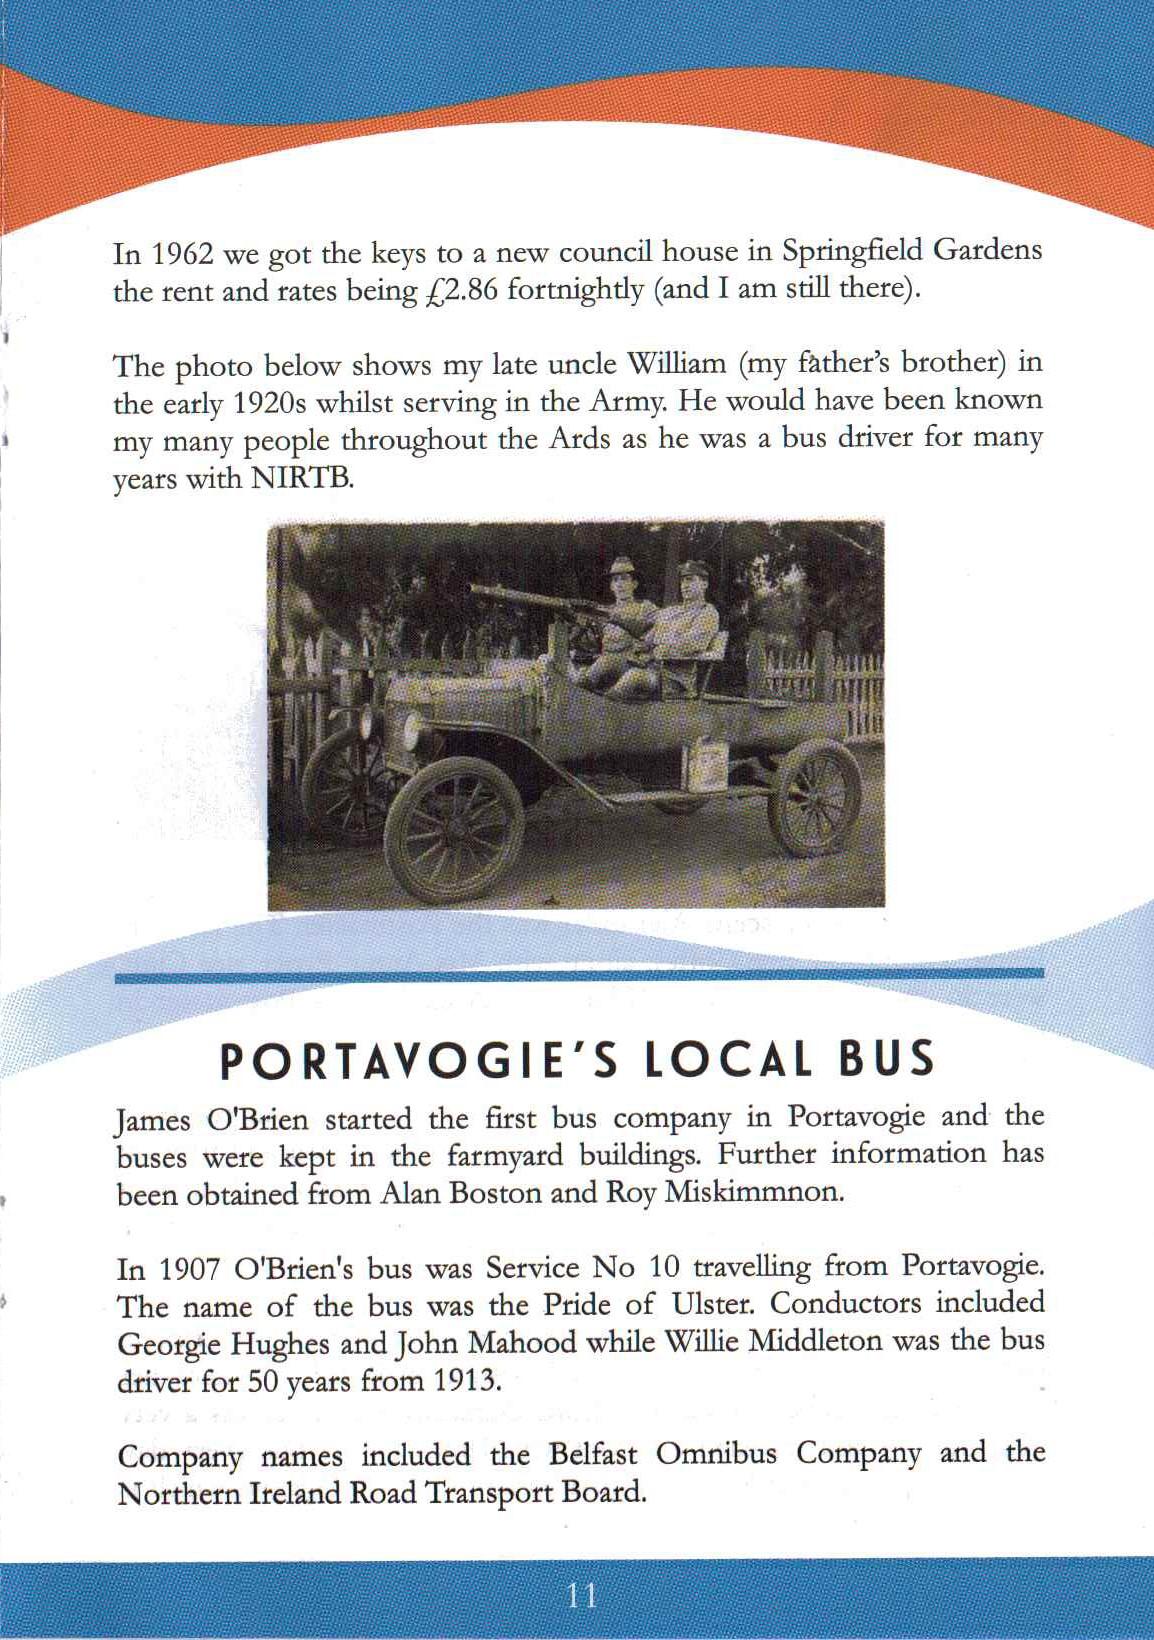 pg 11